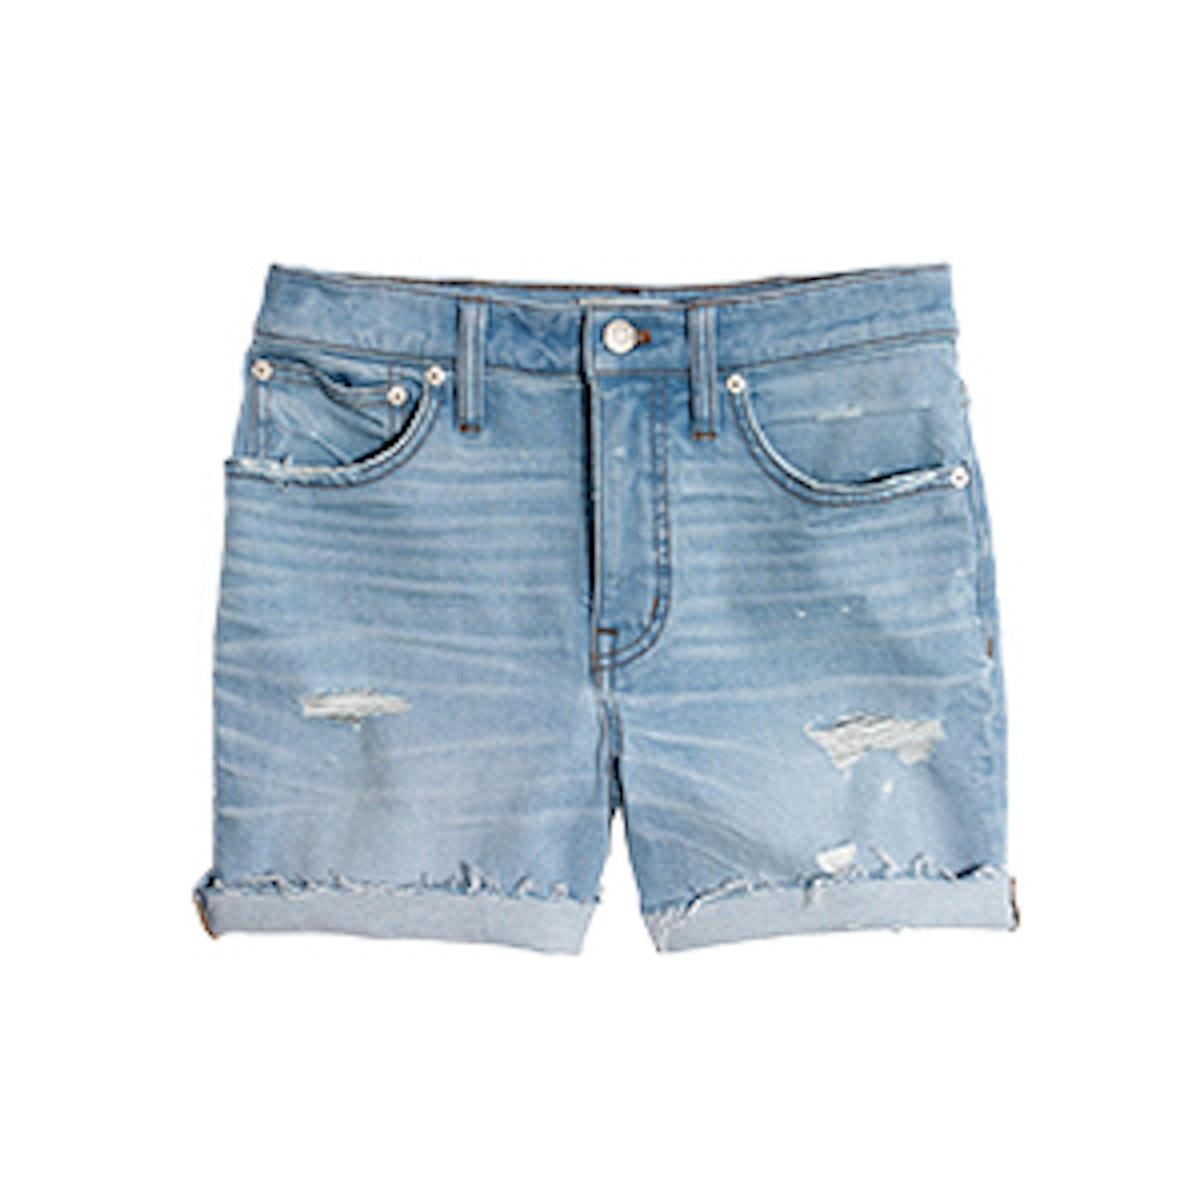 High-Rise Denim Shorts in Posey Wash